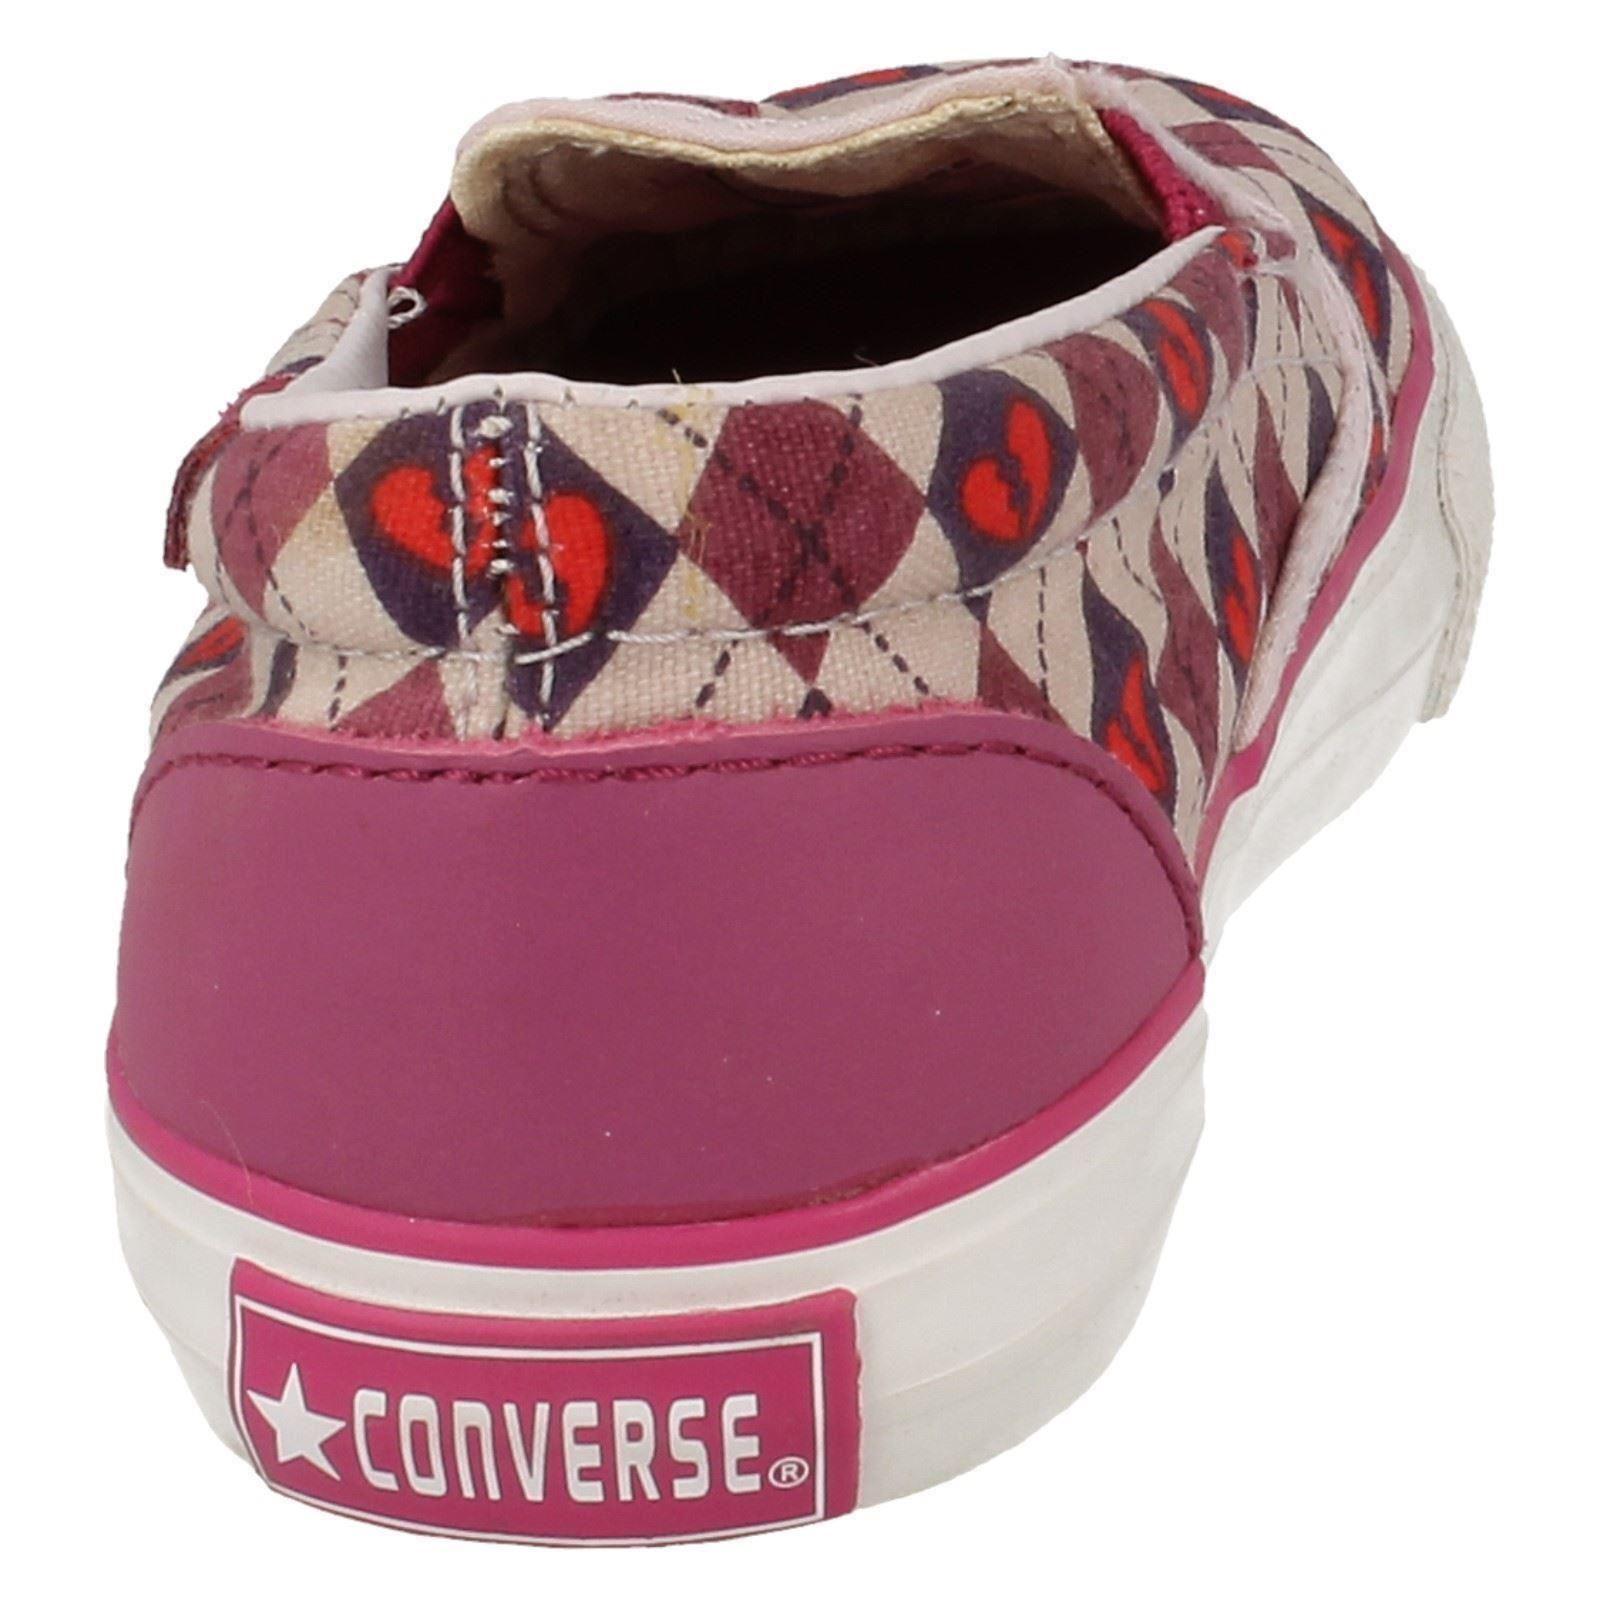 Girl Converse Flats Style Inft Skid Grip Ev-W